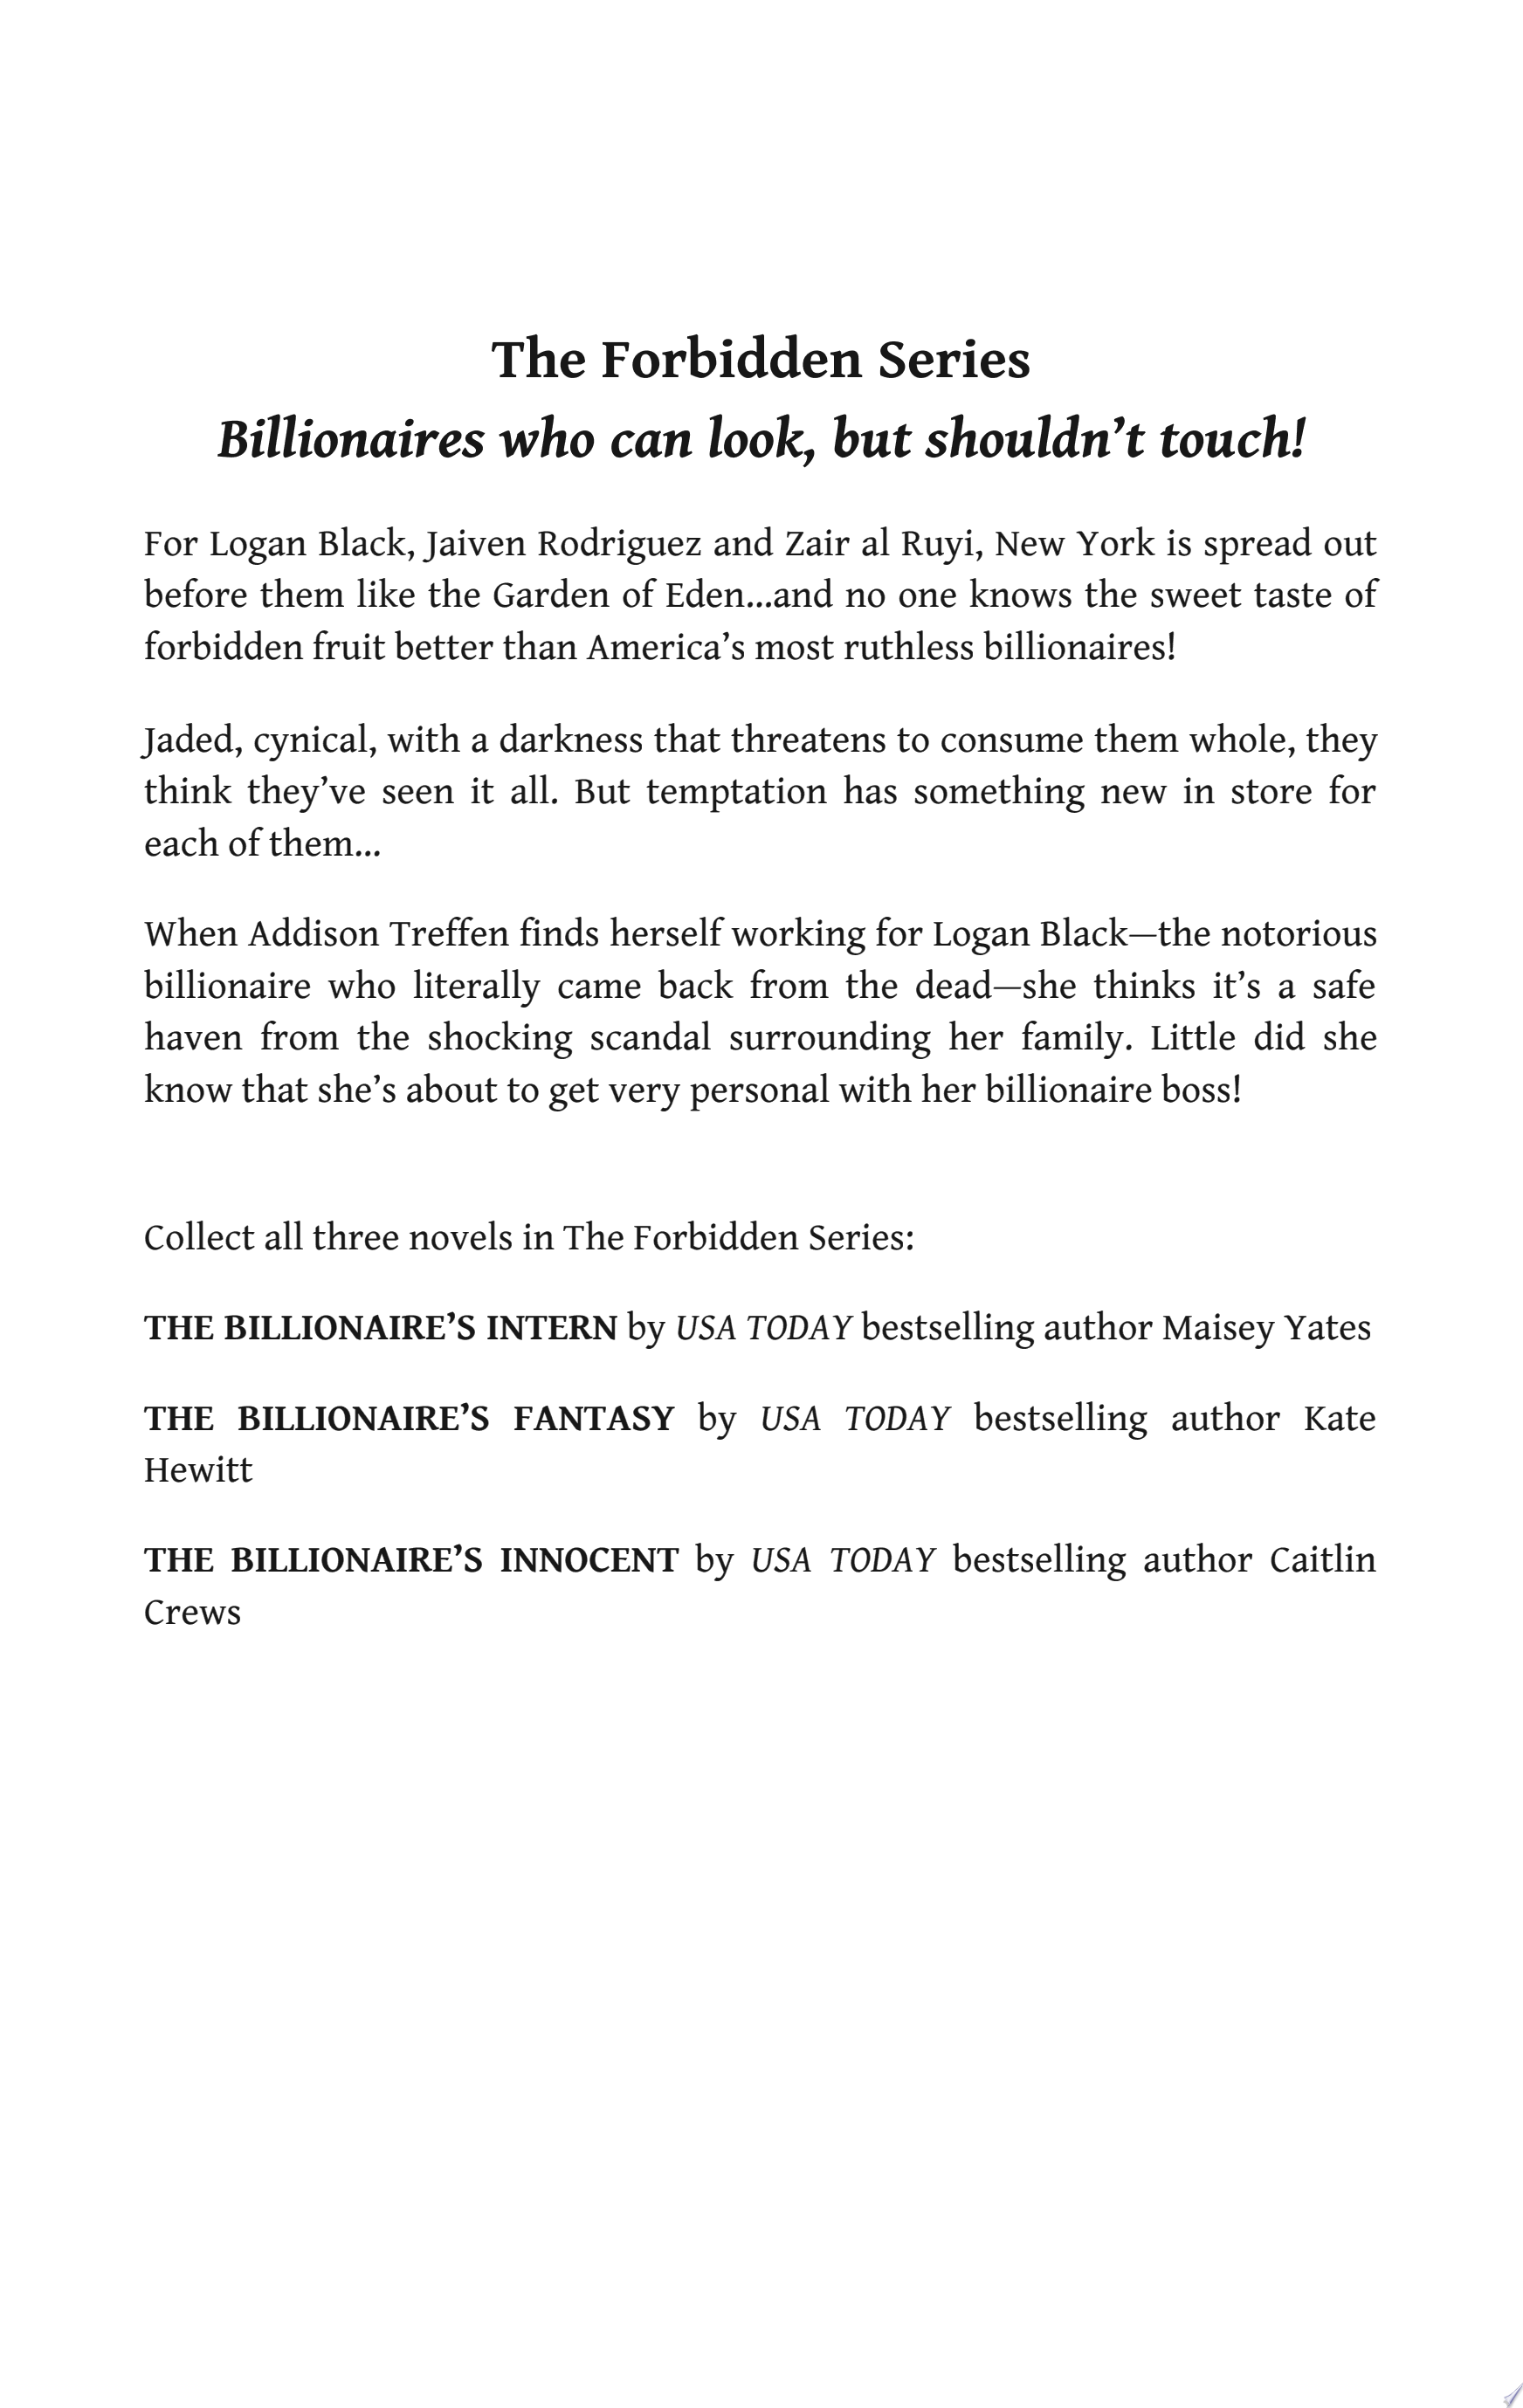 The Billionaire s Intern  Mills   Boon M B   The Forbidden Series  Book 1